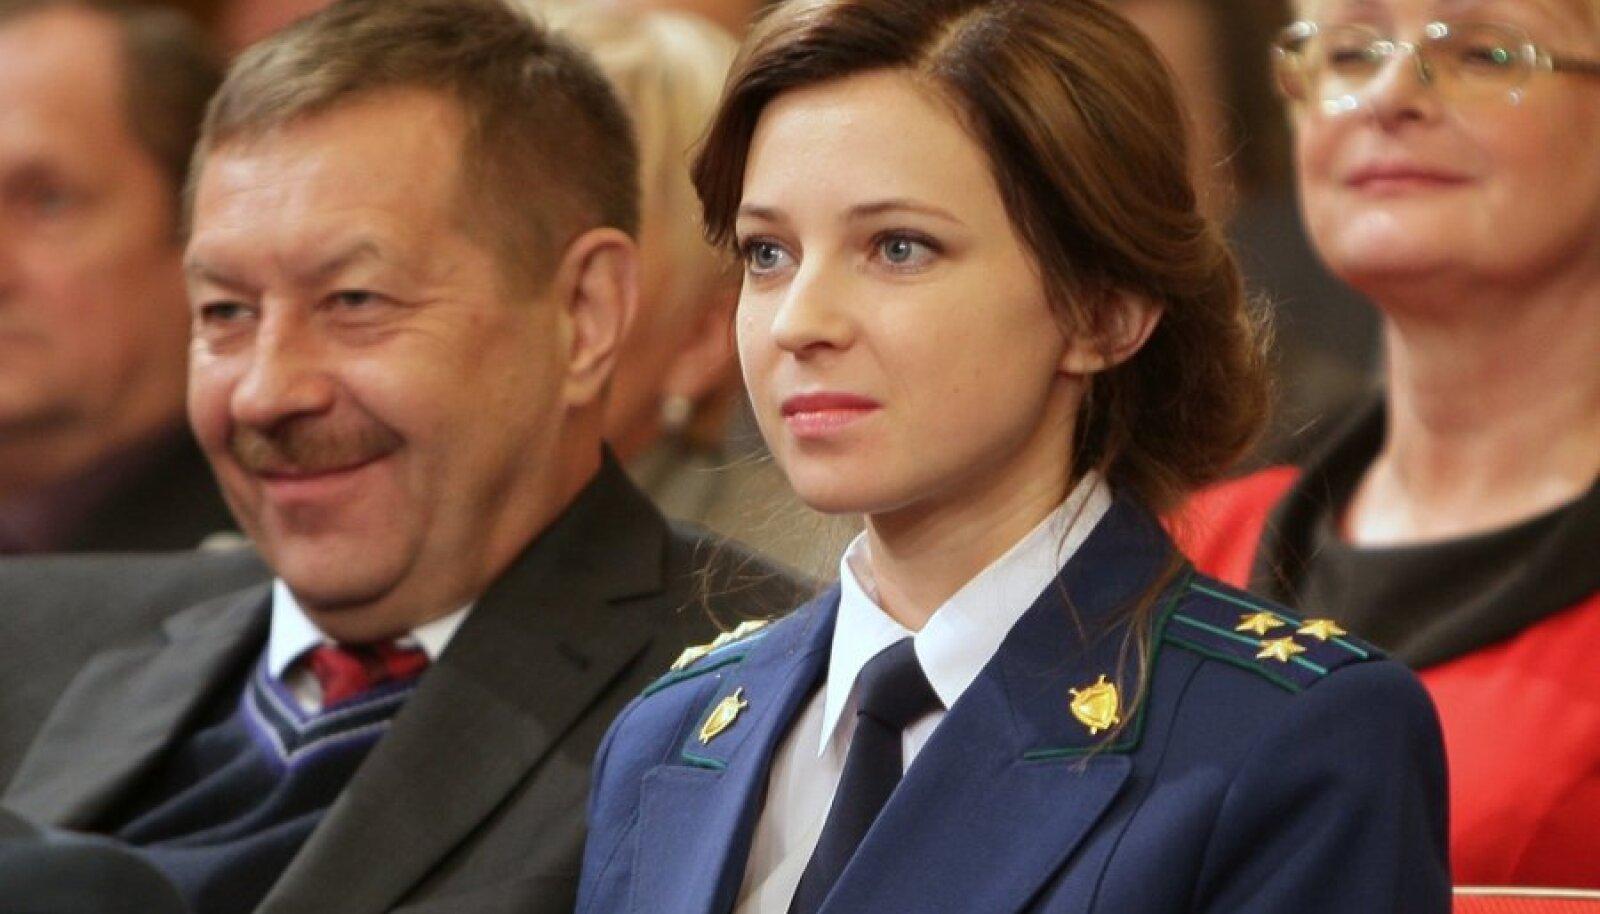 Electing Head of the Republic of Crimea